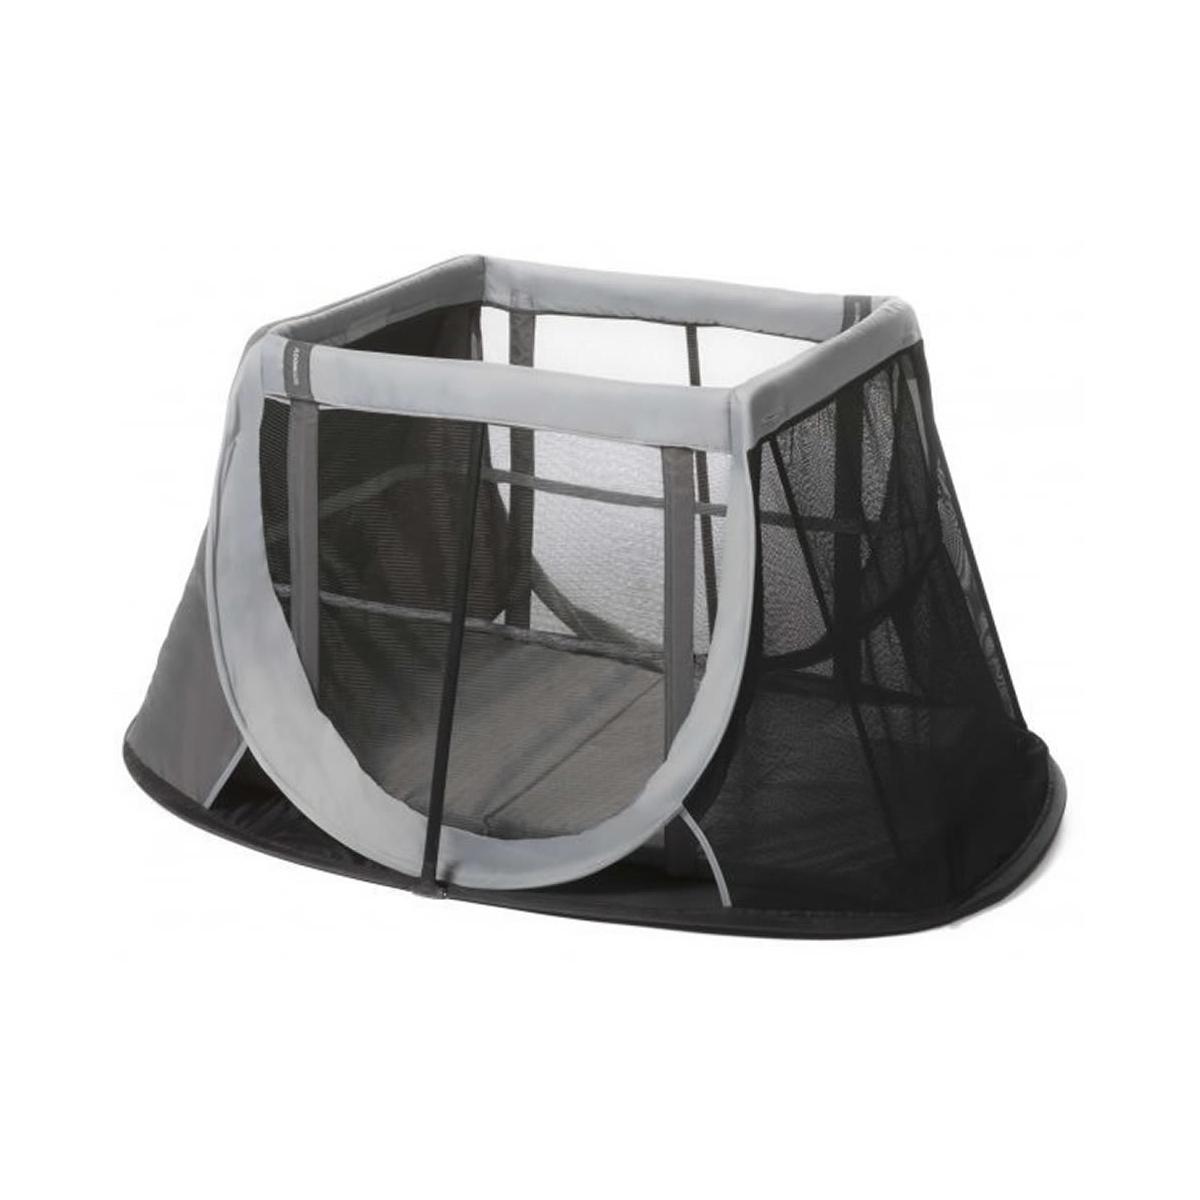 AeroMoov Instant Travel Cot-Grey Rock Includes Carry Bag & Mattress!